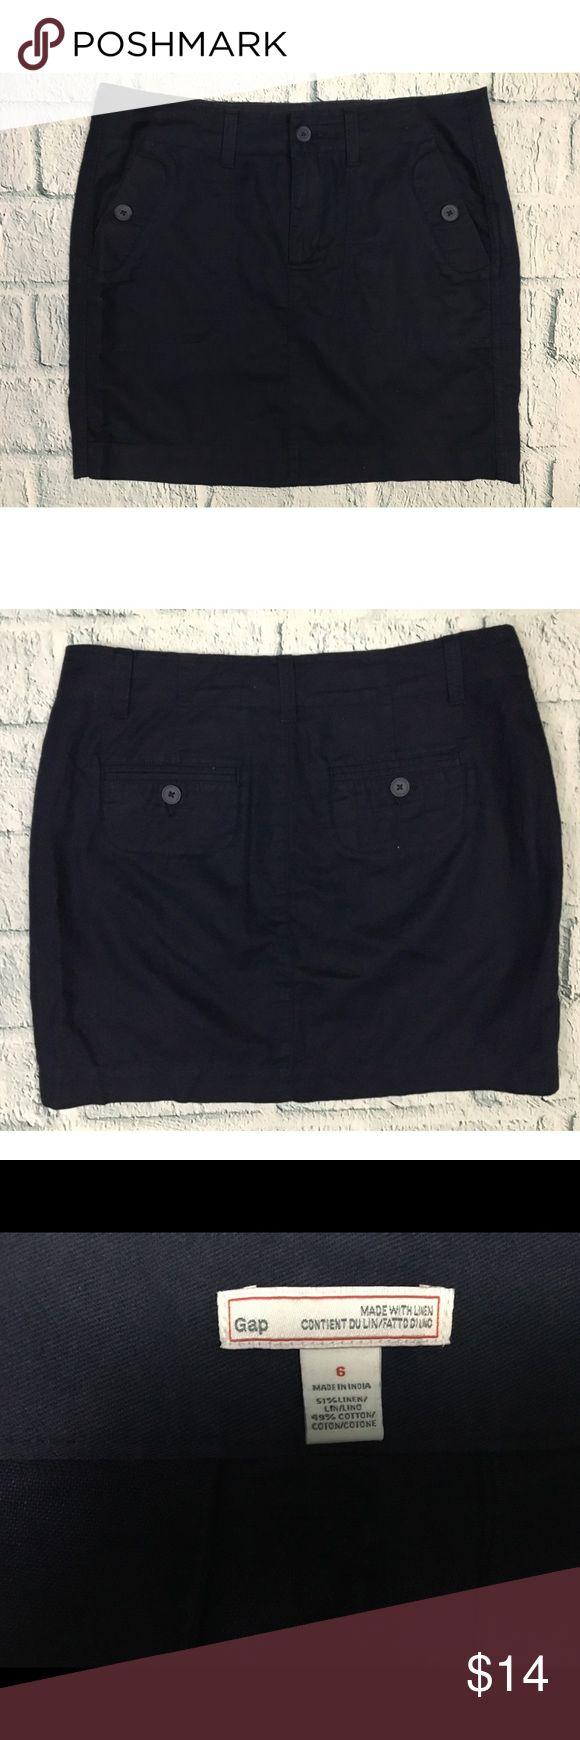 "GAP Navy Blue Linen Blend Mini Skirt Navy blue casual mini skirt with pockets from GAP Good used condition Linen/Cotton Size 6 --- Waist: 33"" --- Hips: 40"" --- Length: 16.5"" GAP Skirts Mini"